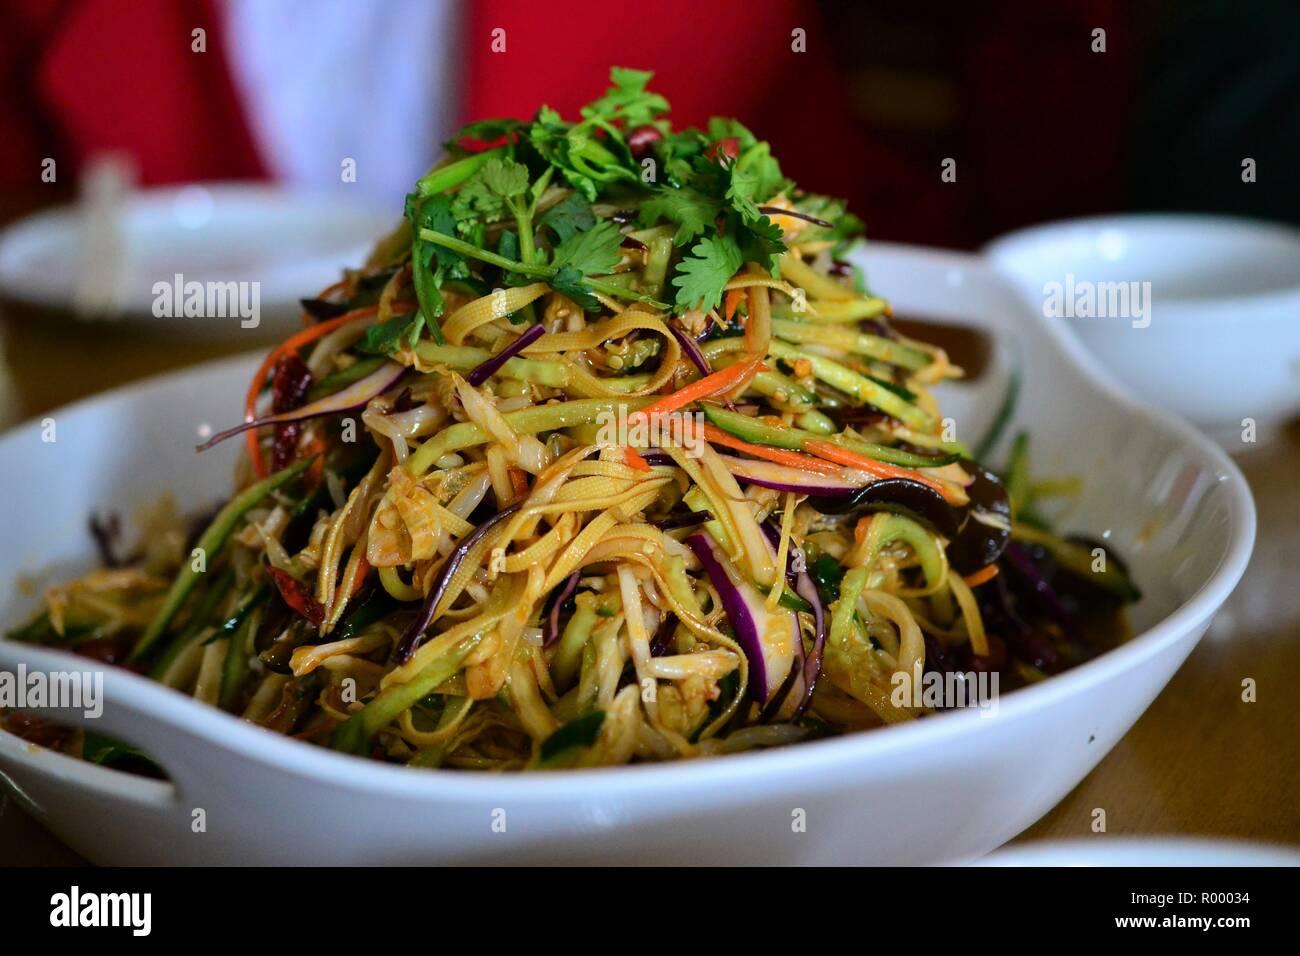 Salade soja style Chinois avec rayures et les nouilles, cuisine ...